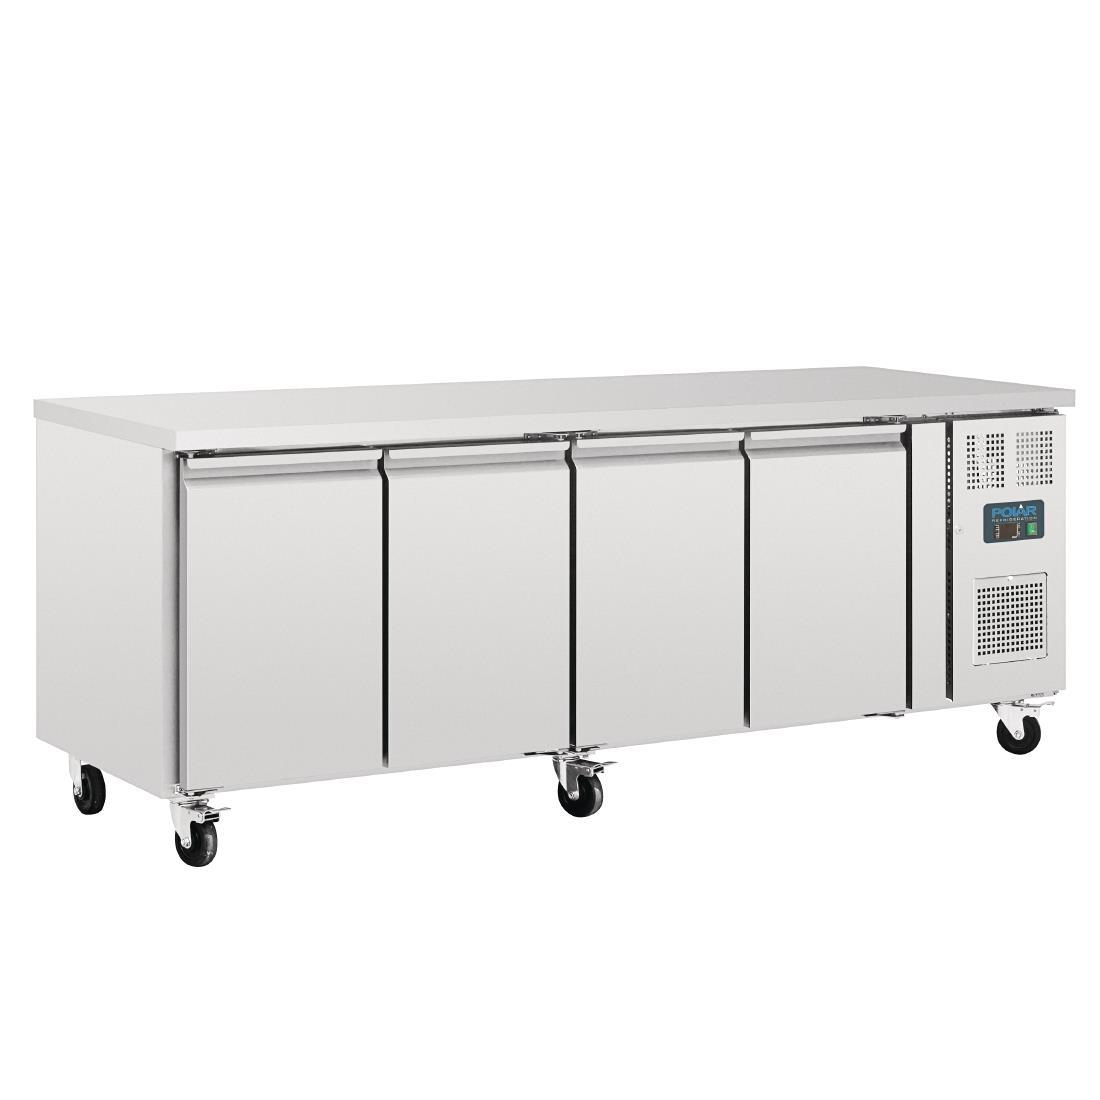 Mostrador frigorífico 4 puertas 553L. 700mm de fondo Polar G598